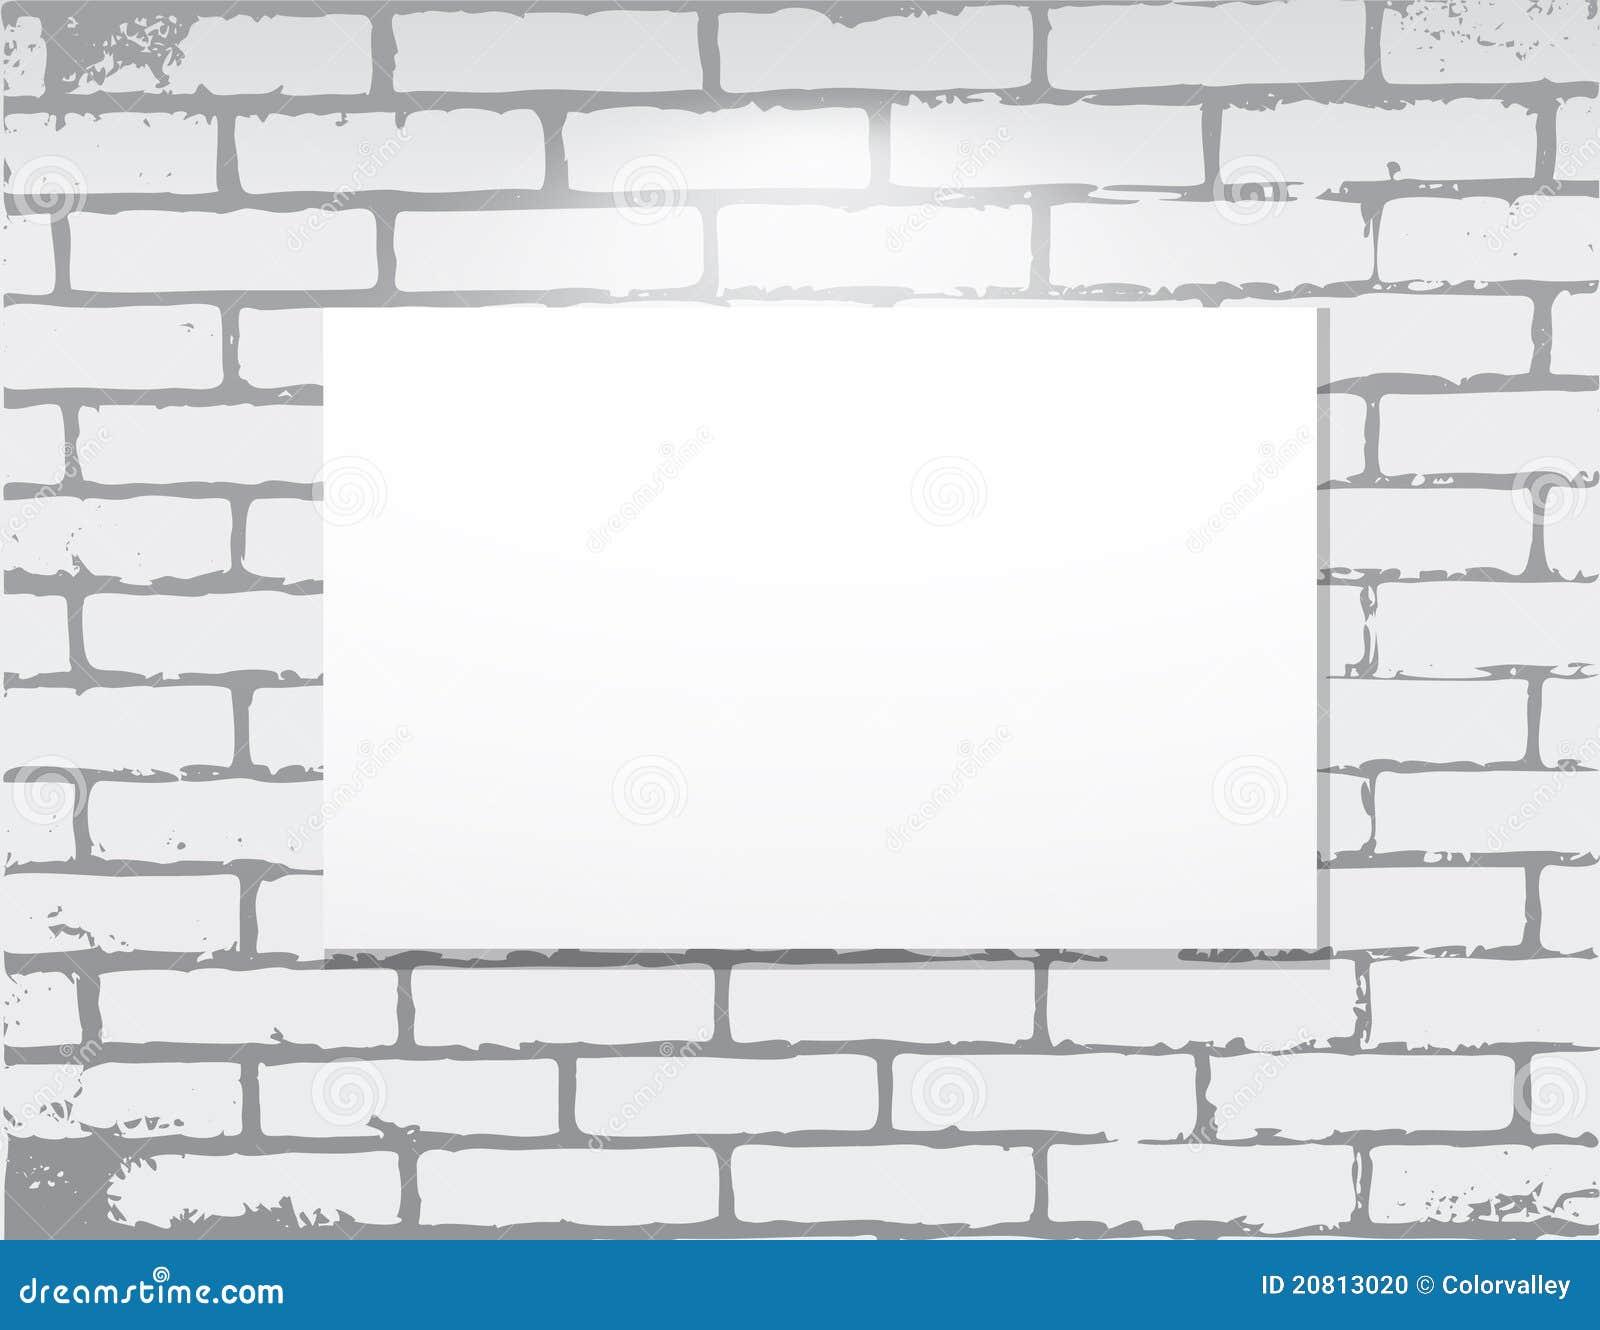 Brick Wall Art vector frame on brick wall. art gallery royalty free stock image